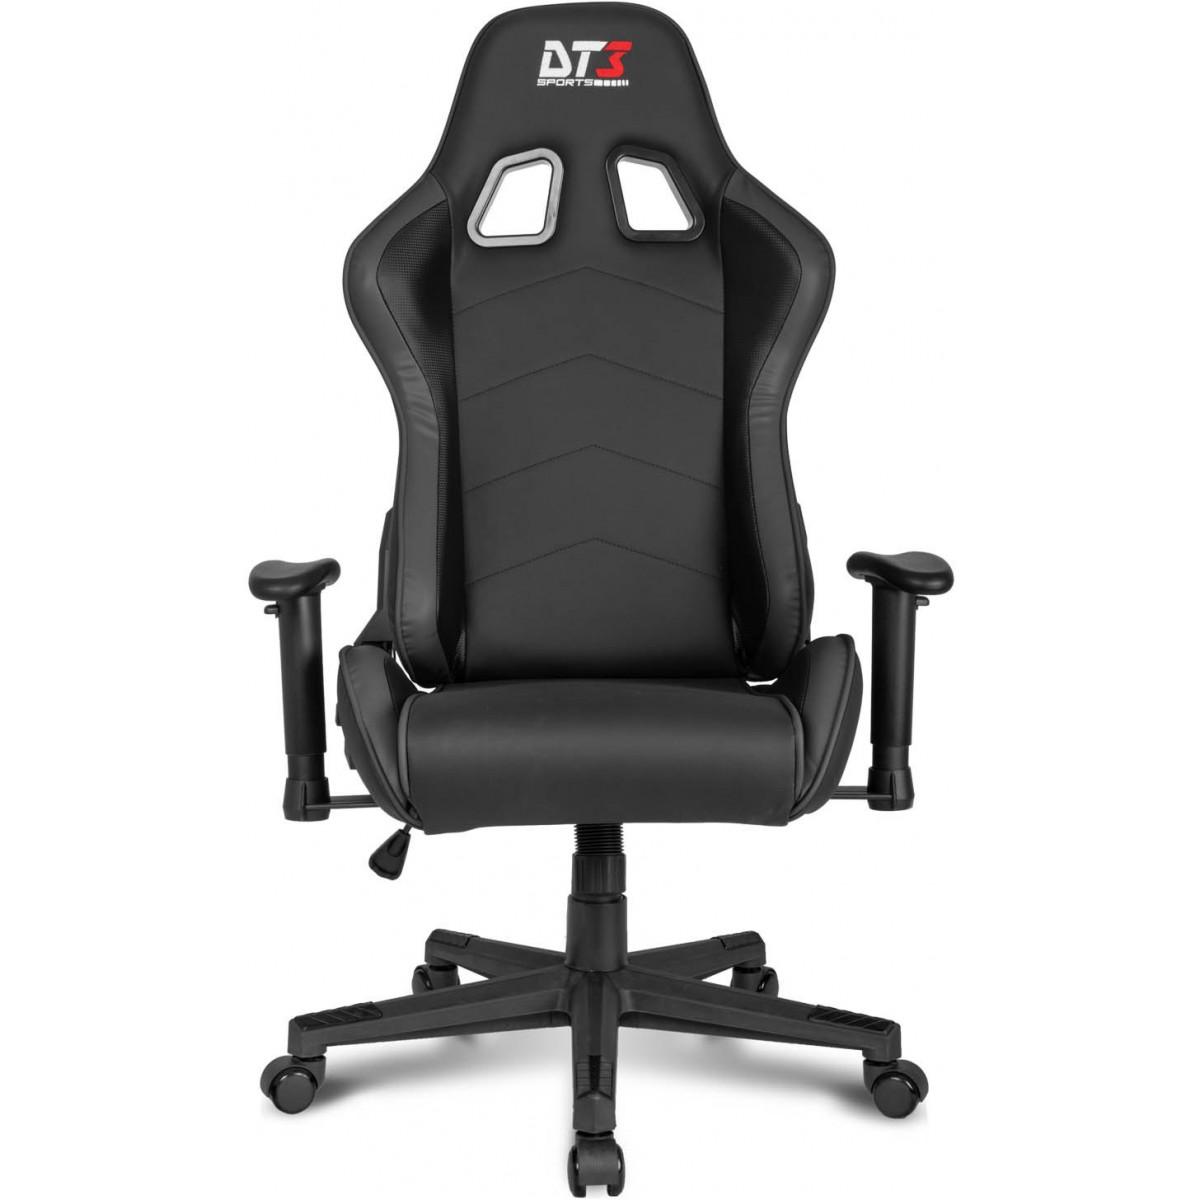 Cadeira Gamer DT3sports Jaguar, Dark Grey